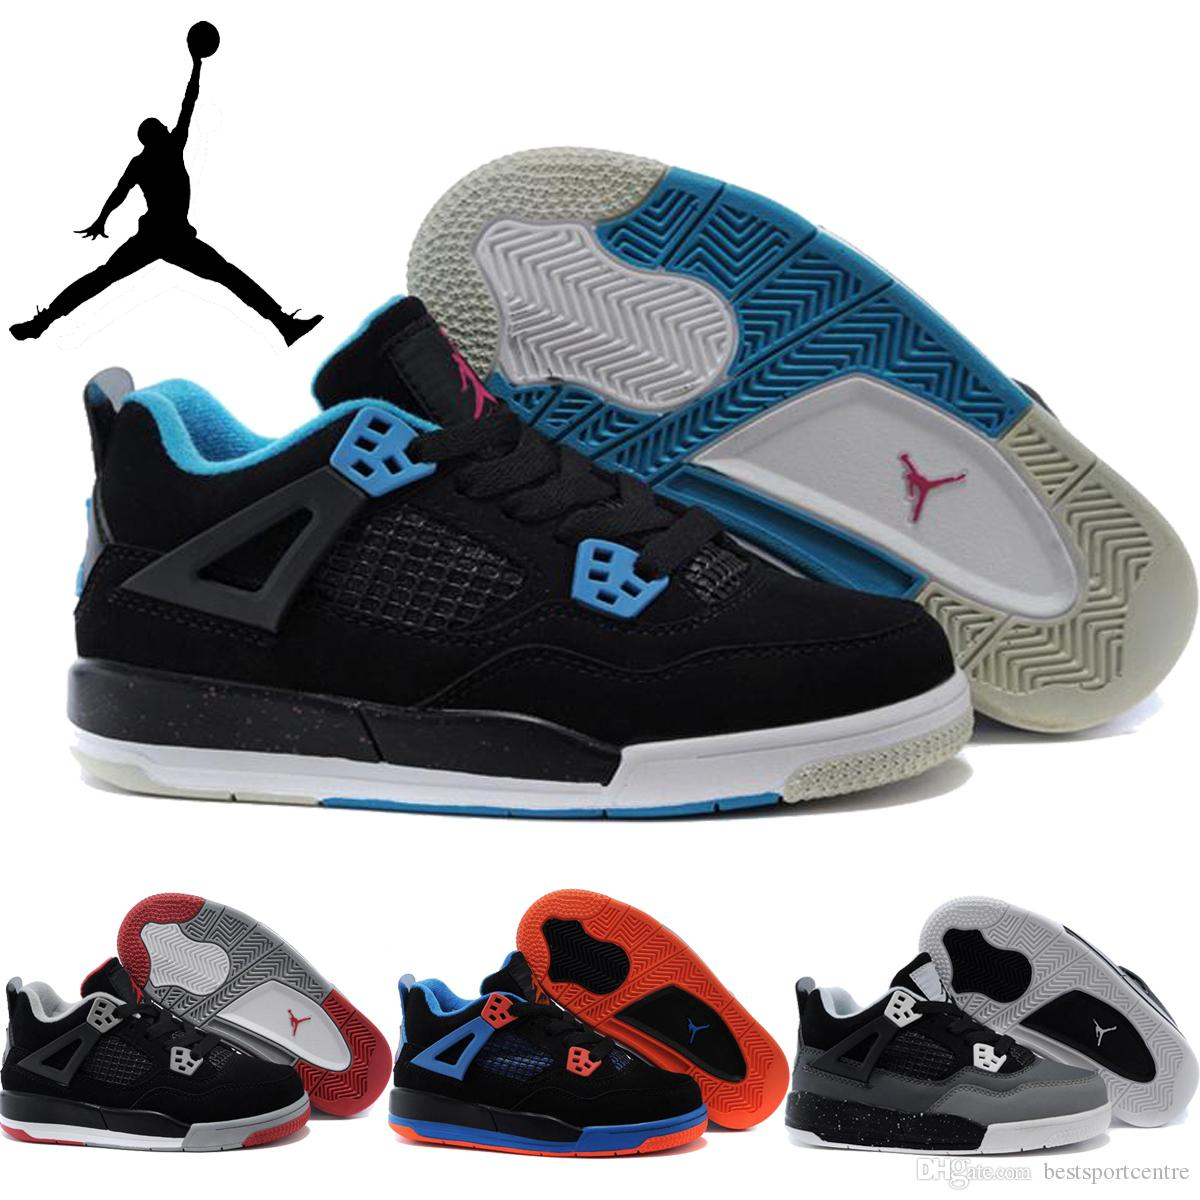 Nike Air Jordan Retro 4 Children Shoes Boys Girls